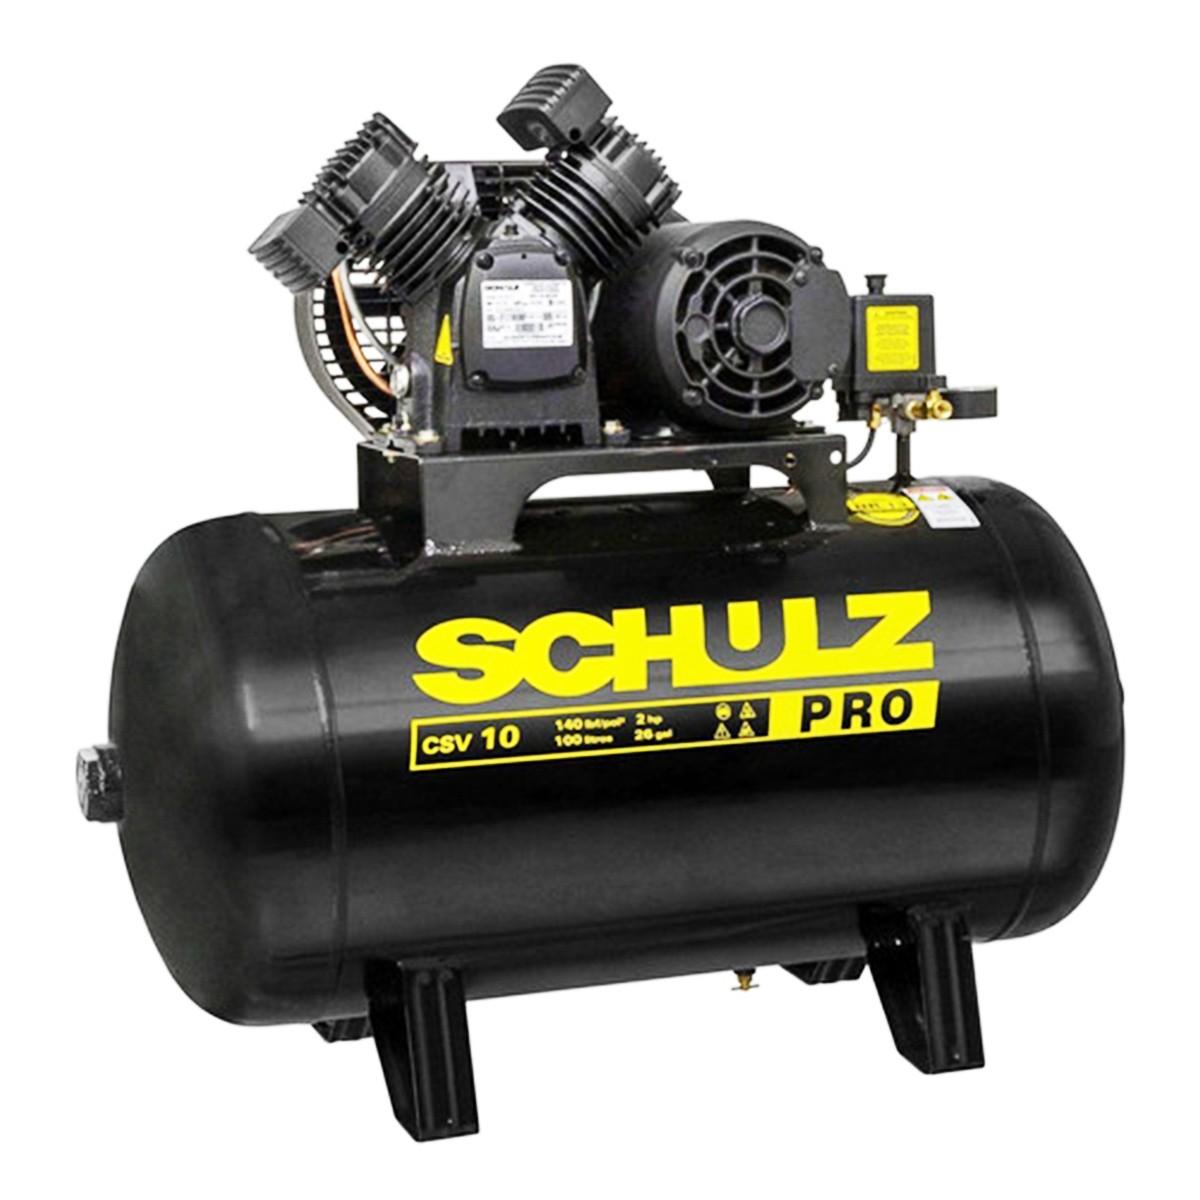 Compressor De Ar 10 Pés 100l 110 Mono Csv-10/100 Pro Schulz